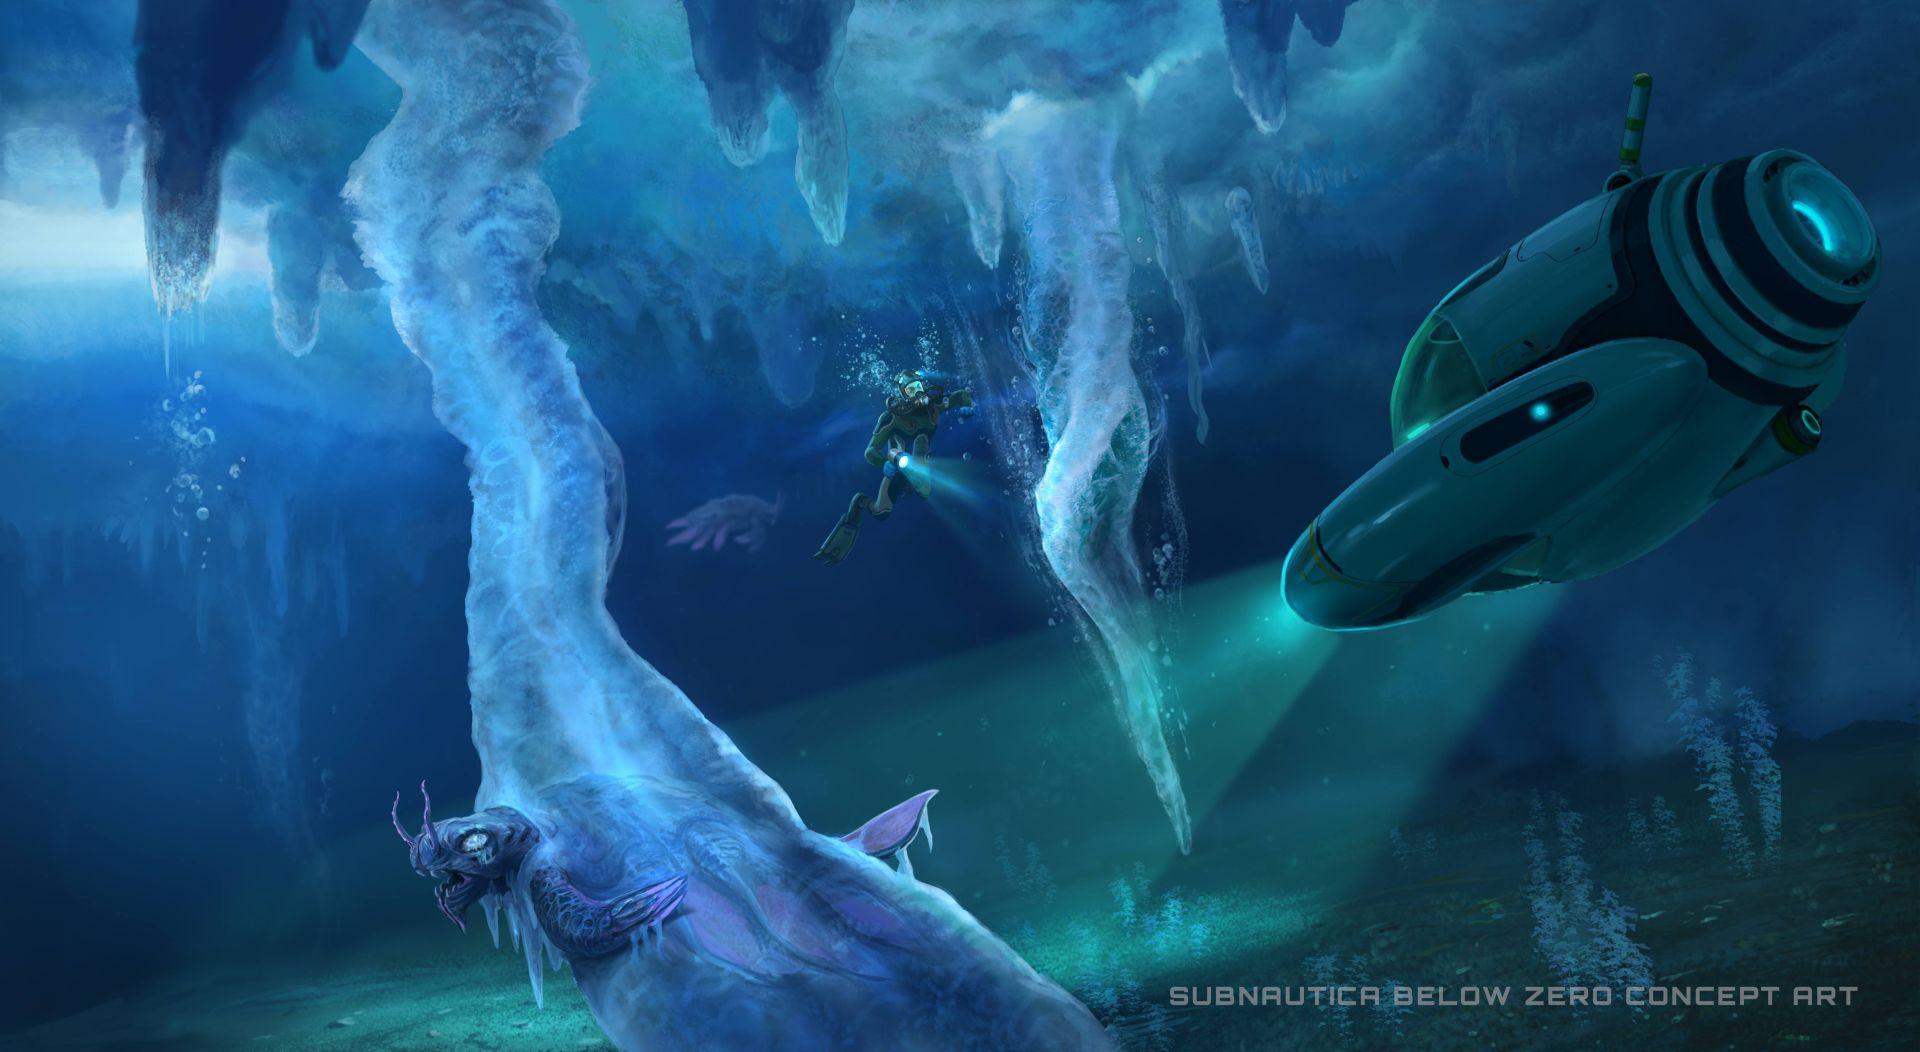 subnautica below zero announced